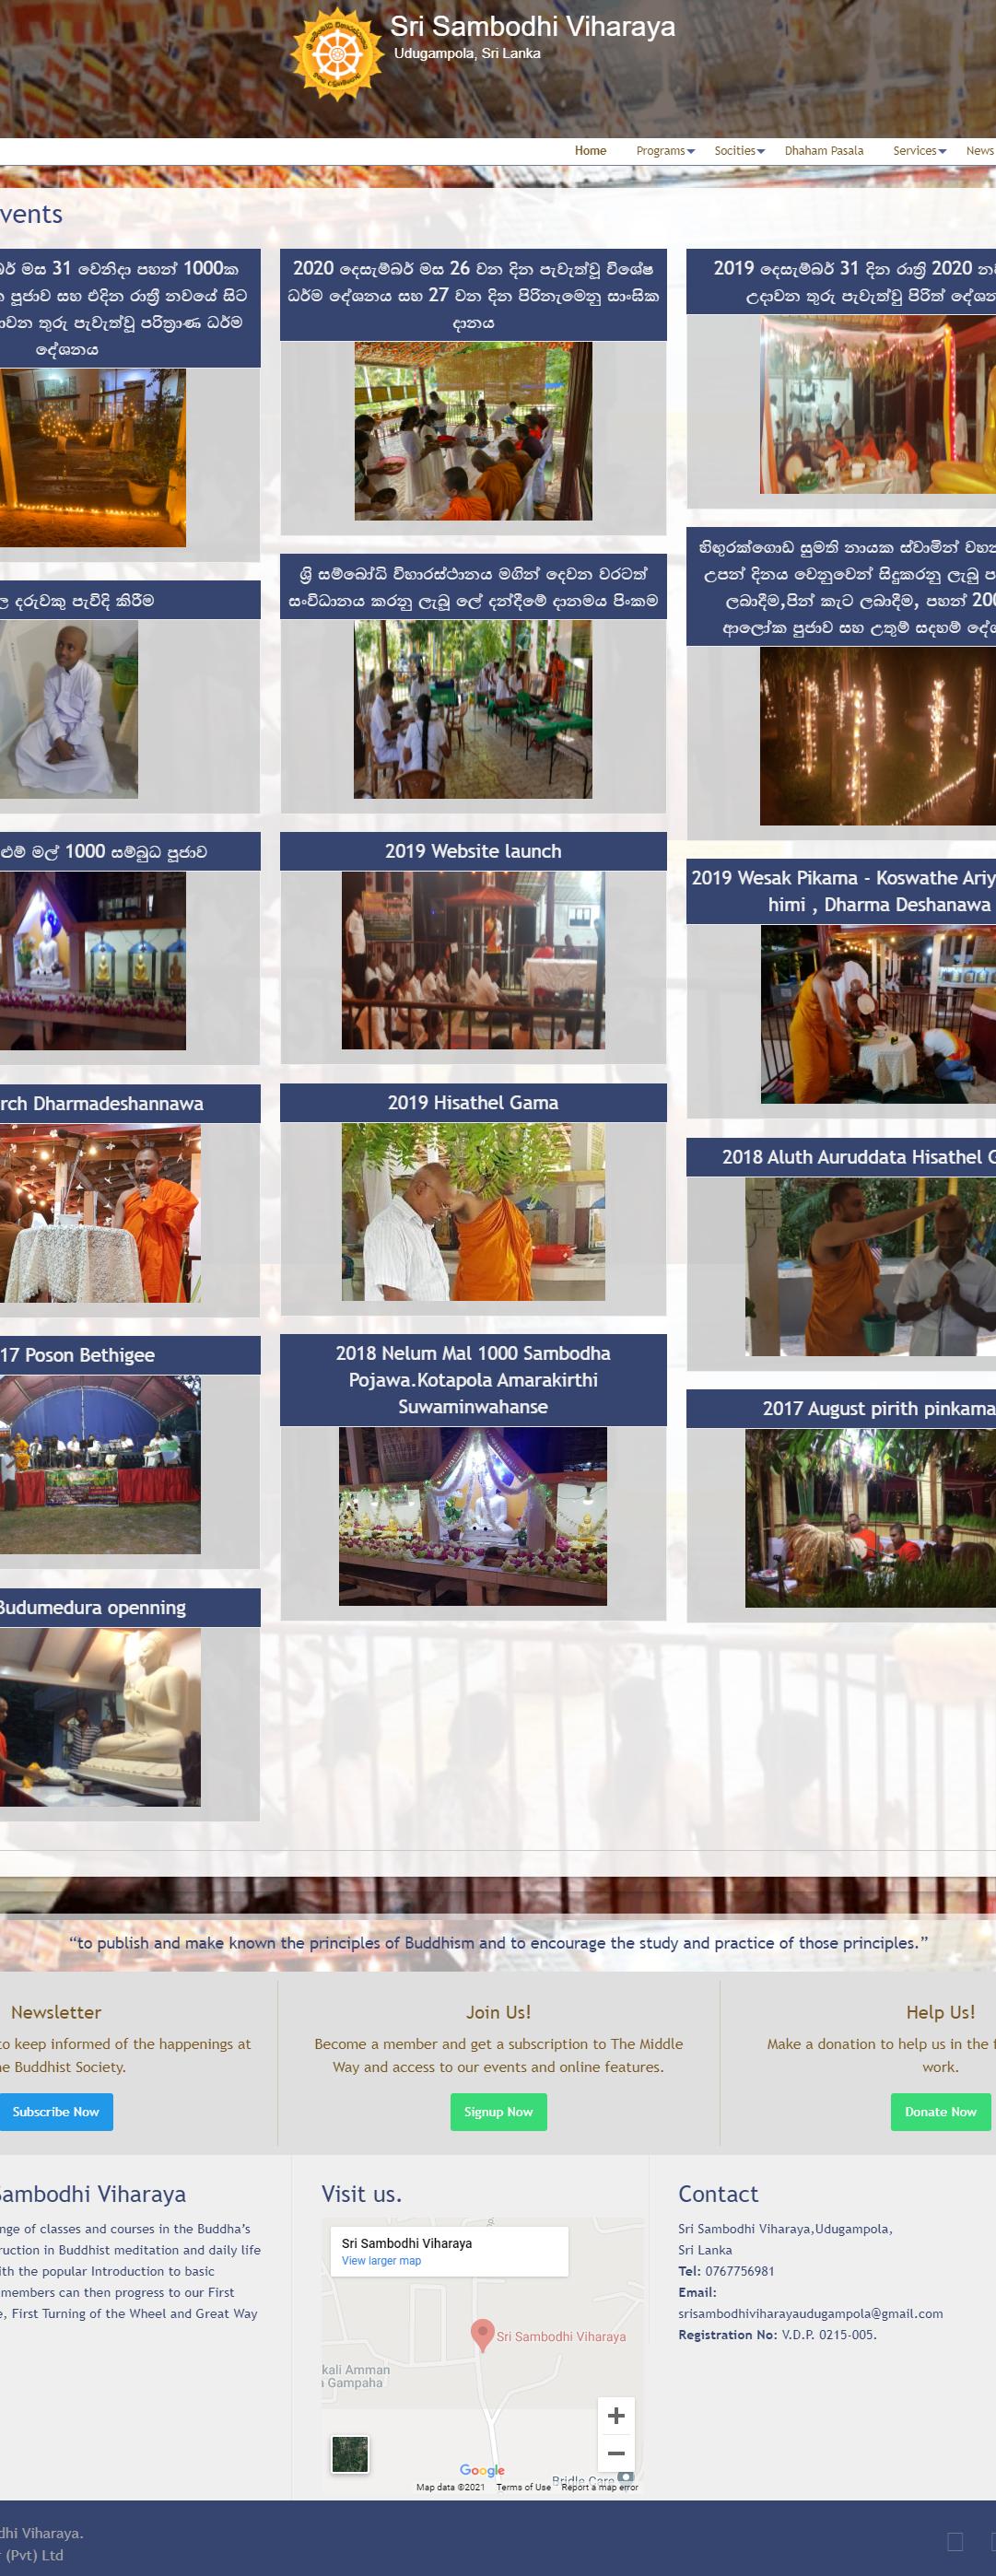 srisambodhi website4